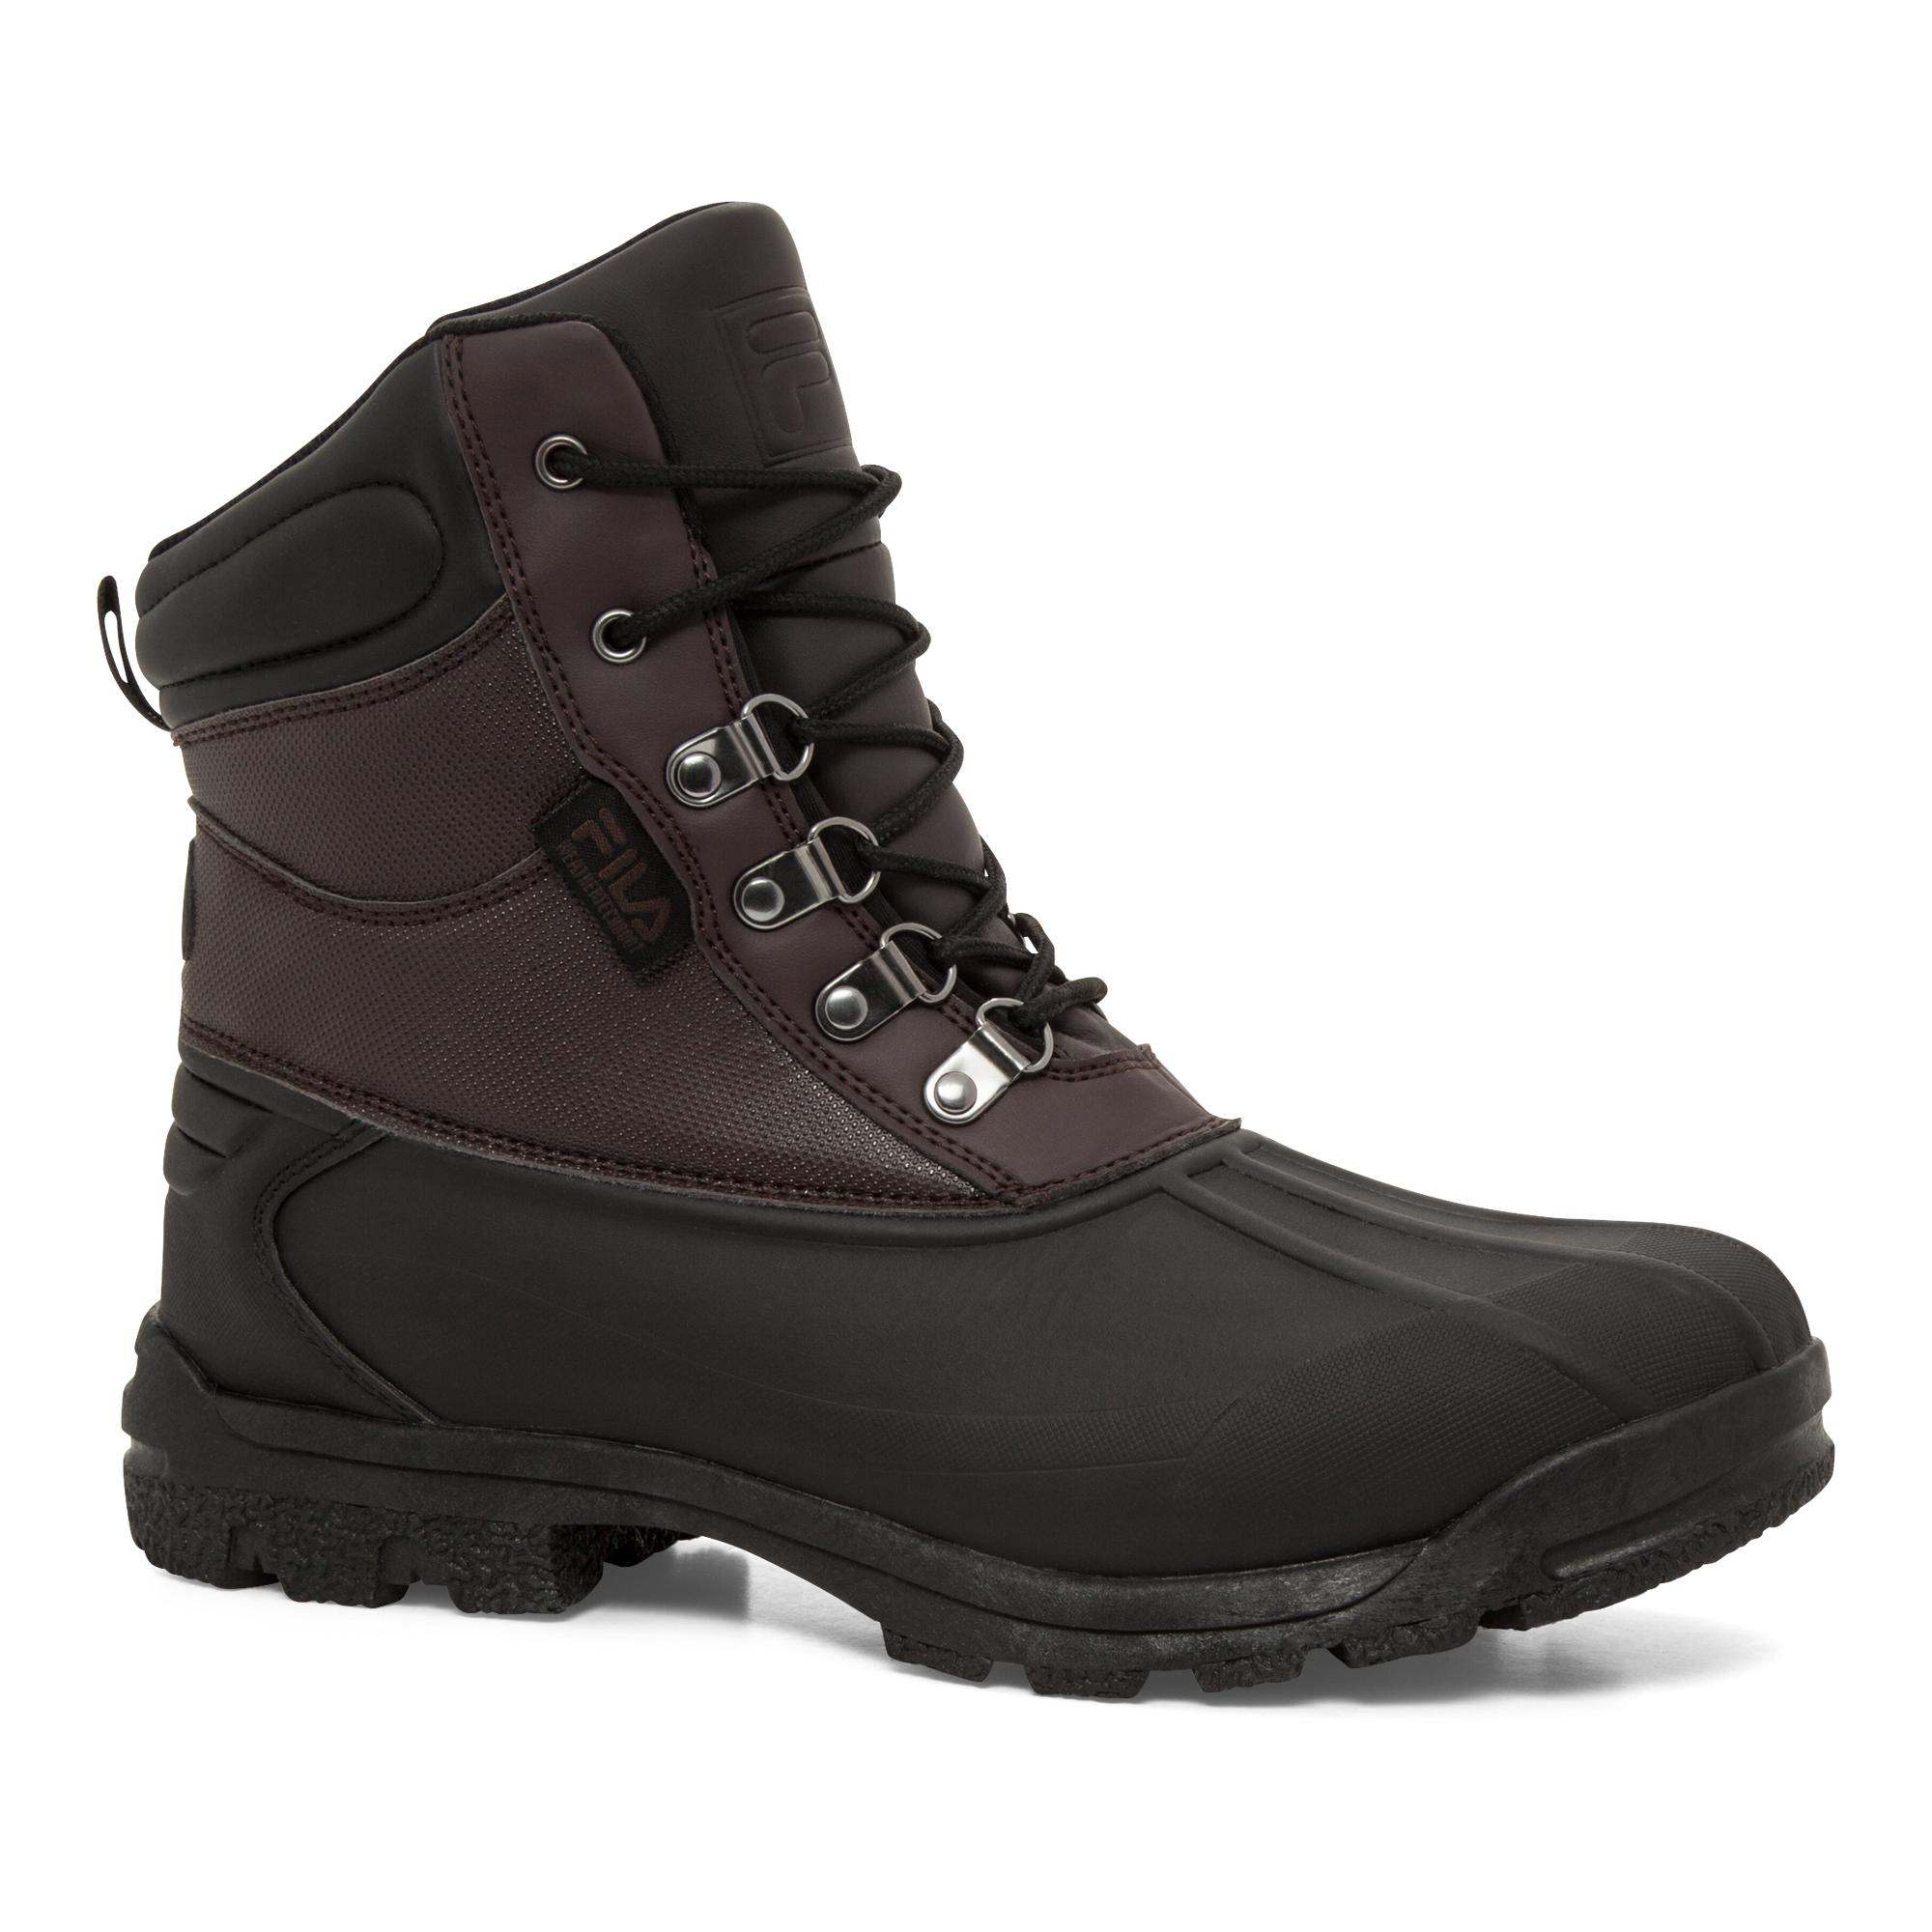 Fila Men's WeatherTech Extreme Waterproof Boot for $20.99